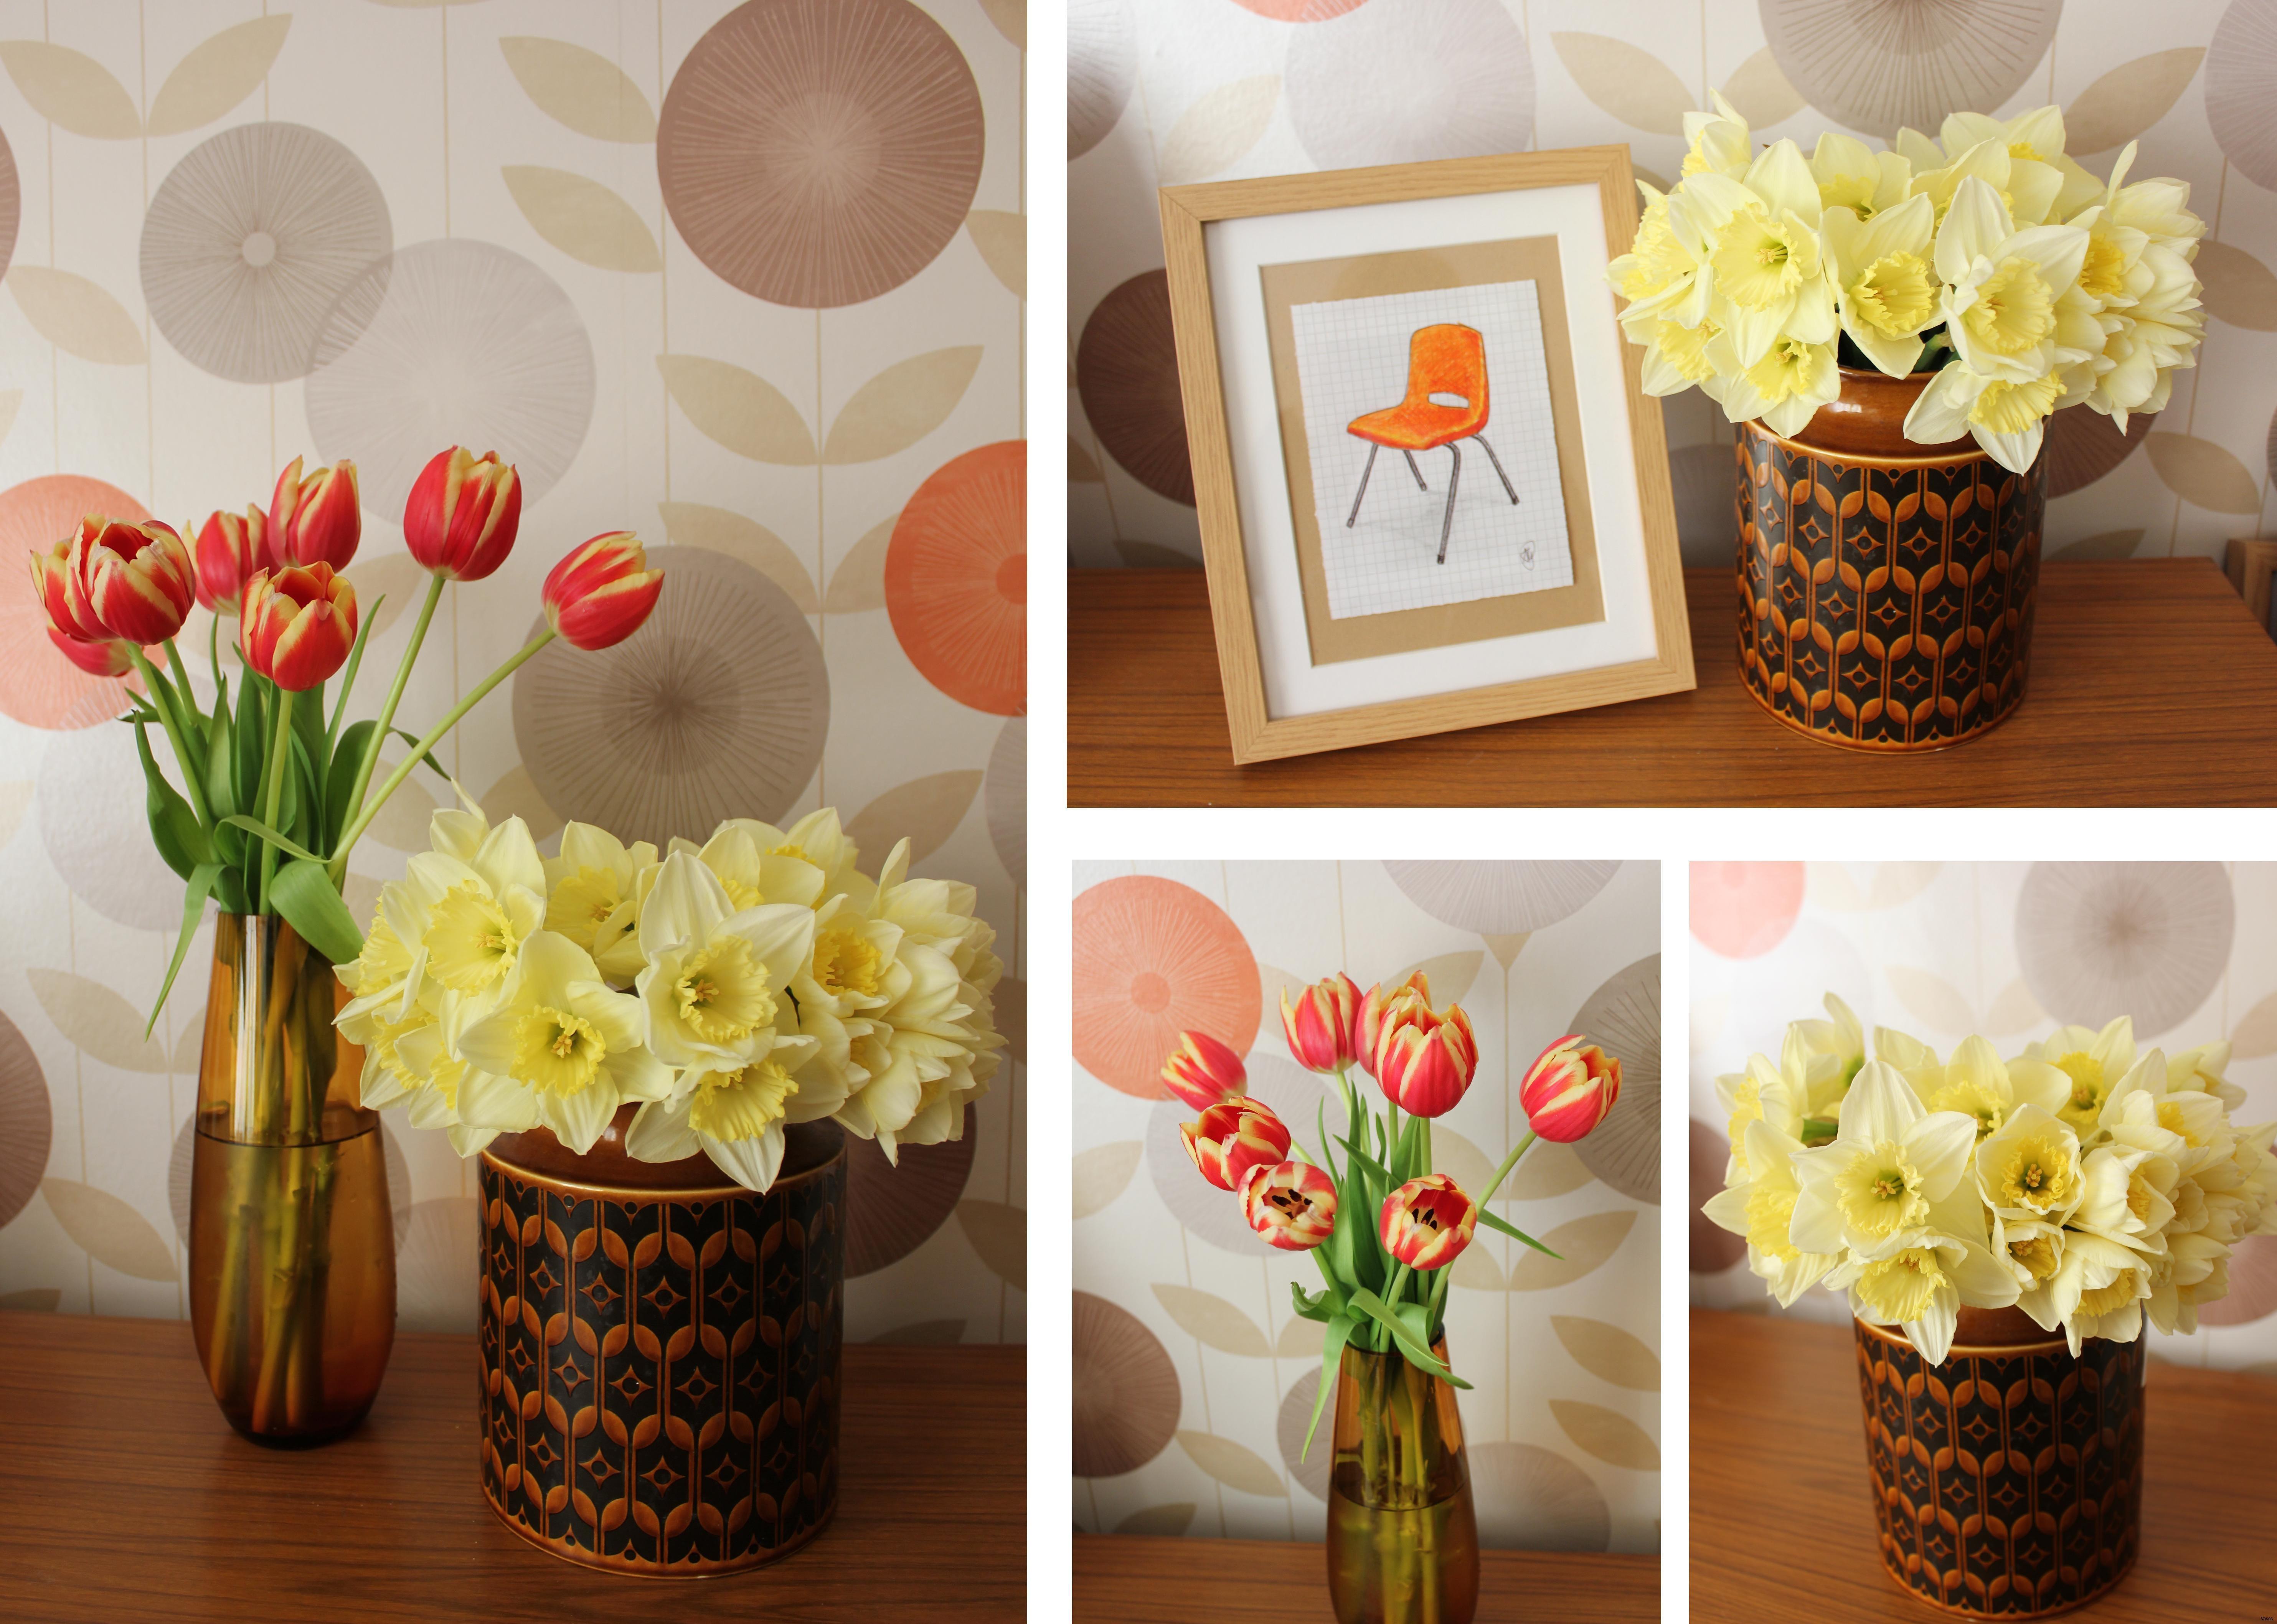 mccoy pottery pink vase of yellow flower vase pictures diy wedding decor luxury diy home decor with diy wedding decor luxury diy home decor vaseh vases decorative